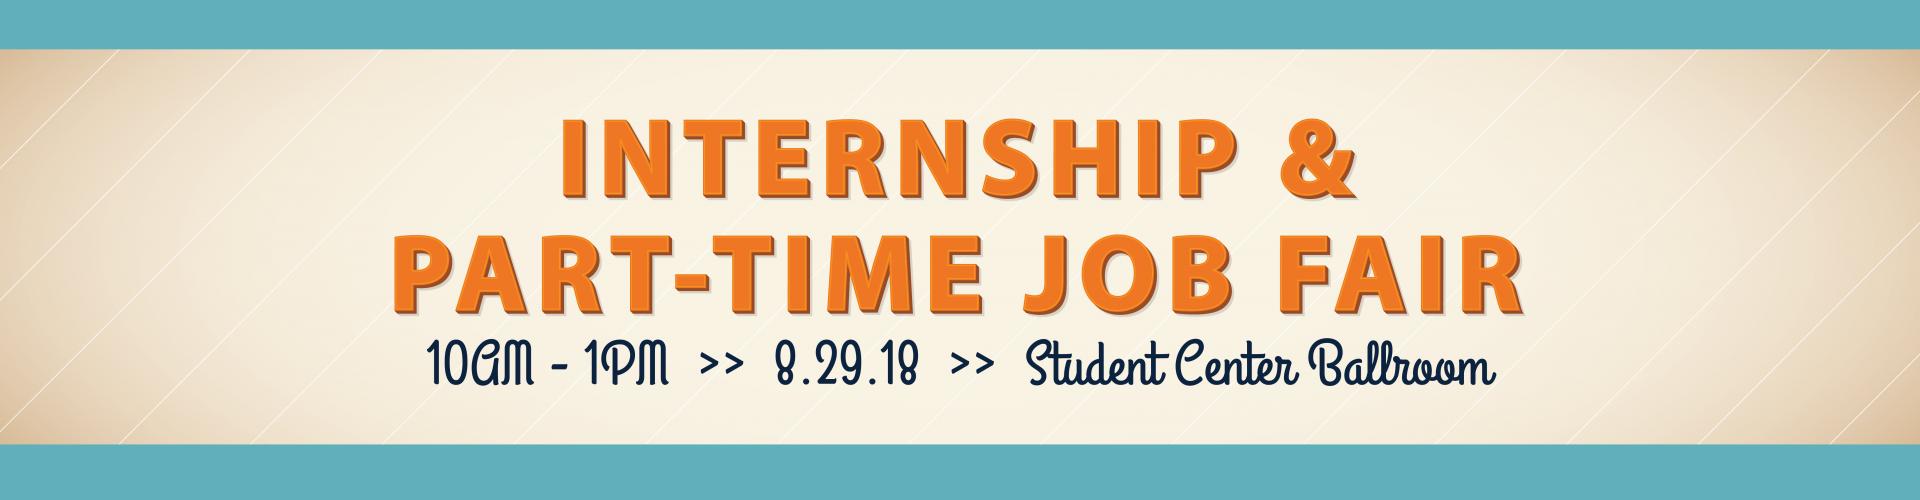 Internship & Part-Time Job Fair Banner: 10am-1pm August 29, 2018 · Auburn University ...